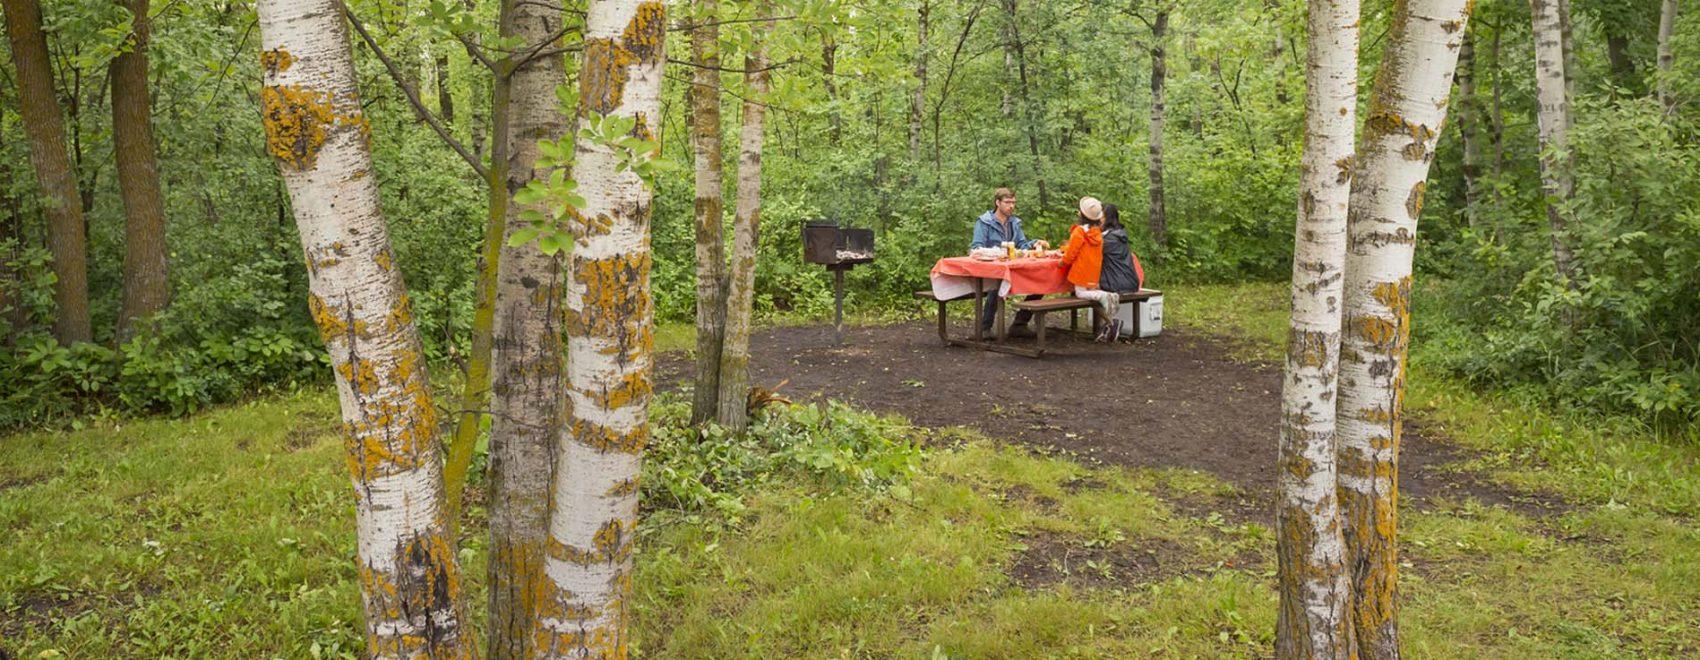 Pike Lake Provincial Park - Credit - Tourism Saskatchewan - Chris Hendrickson